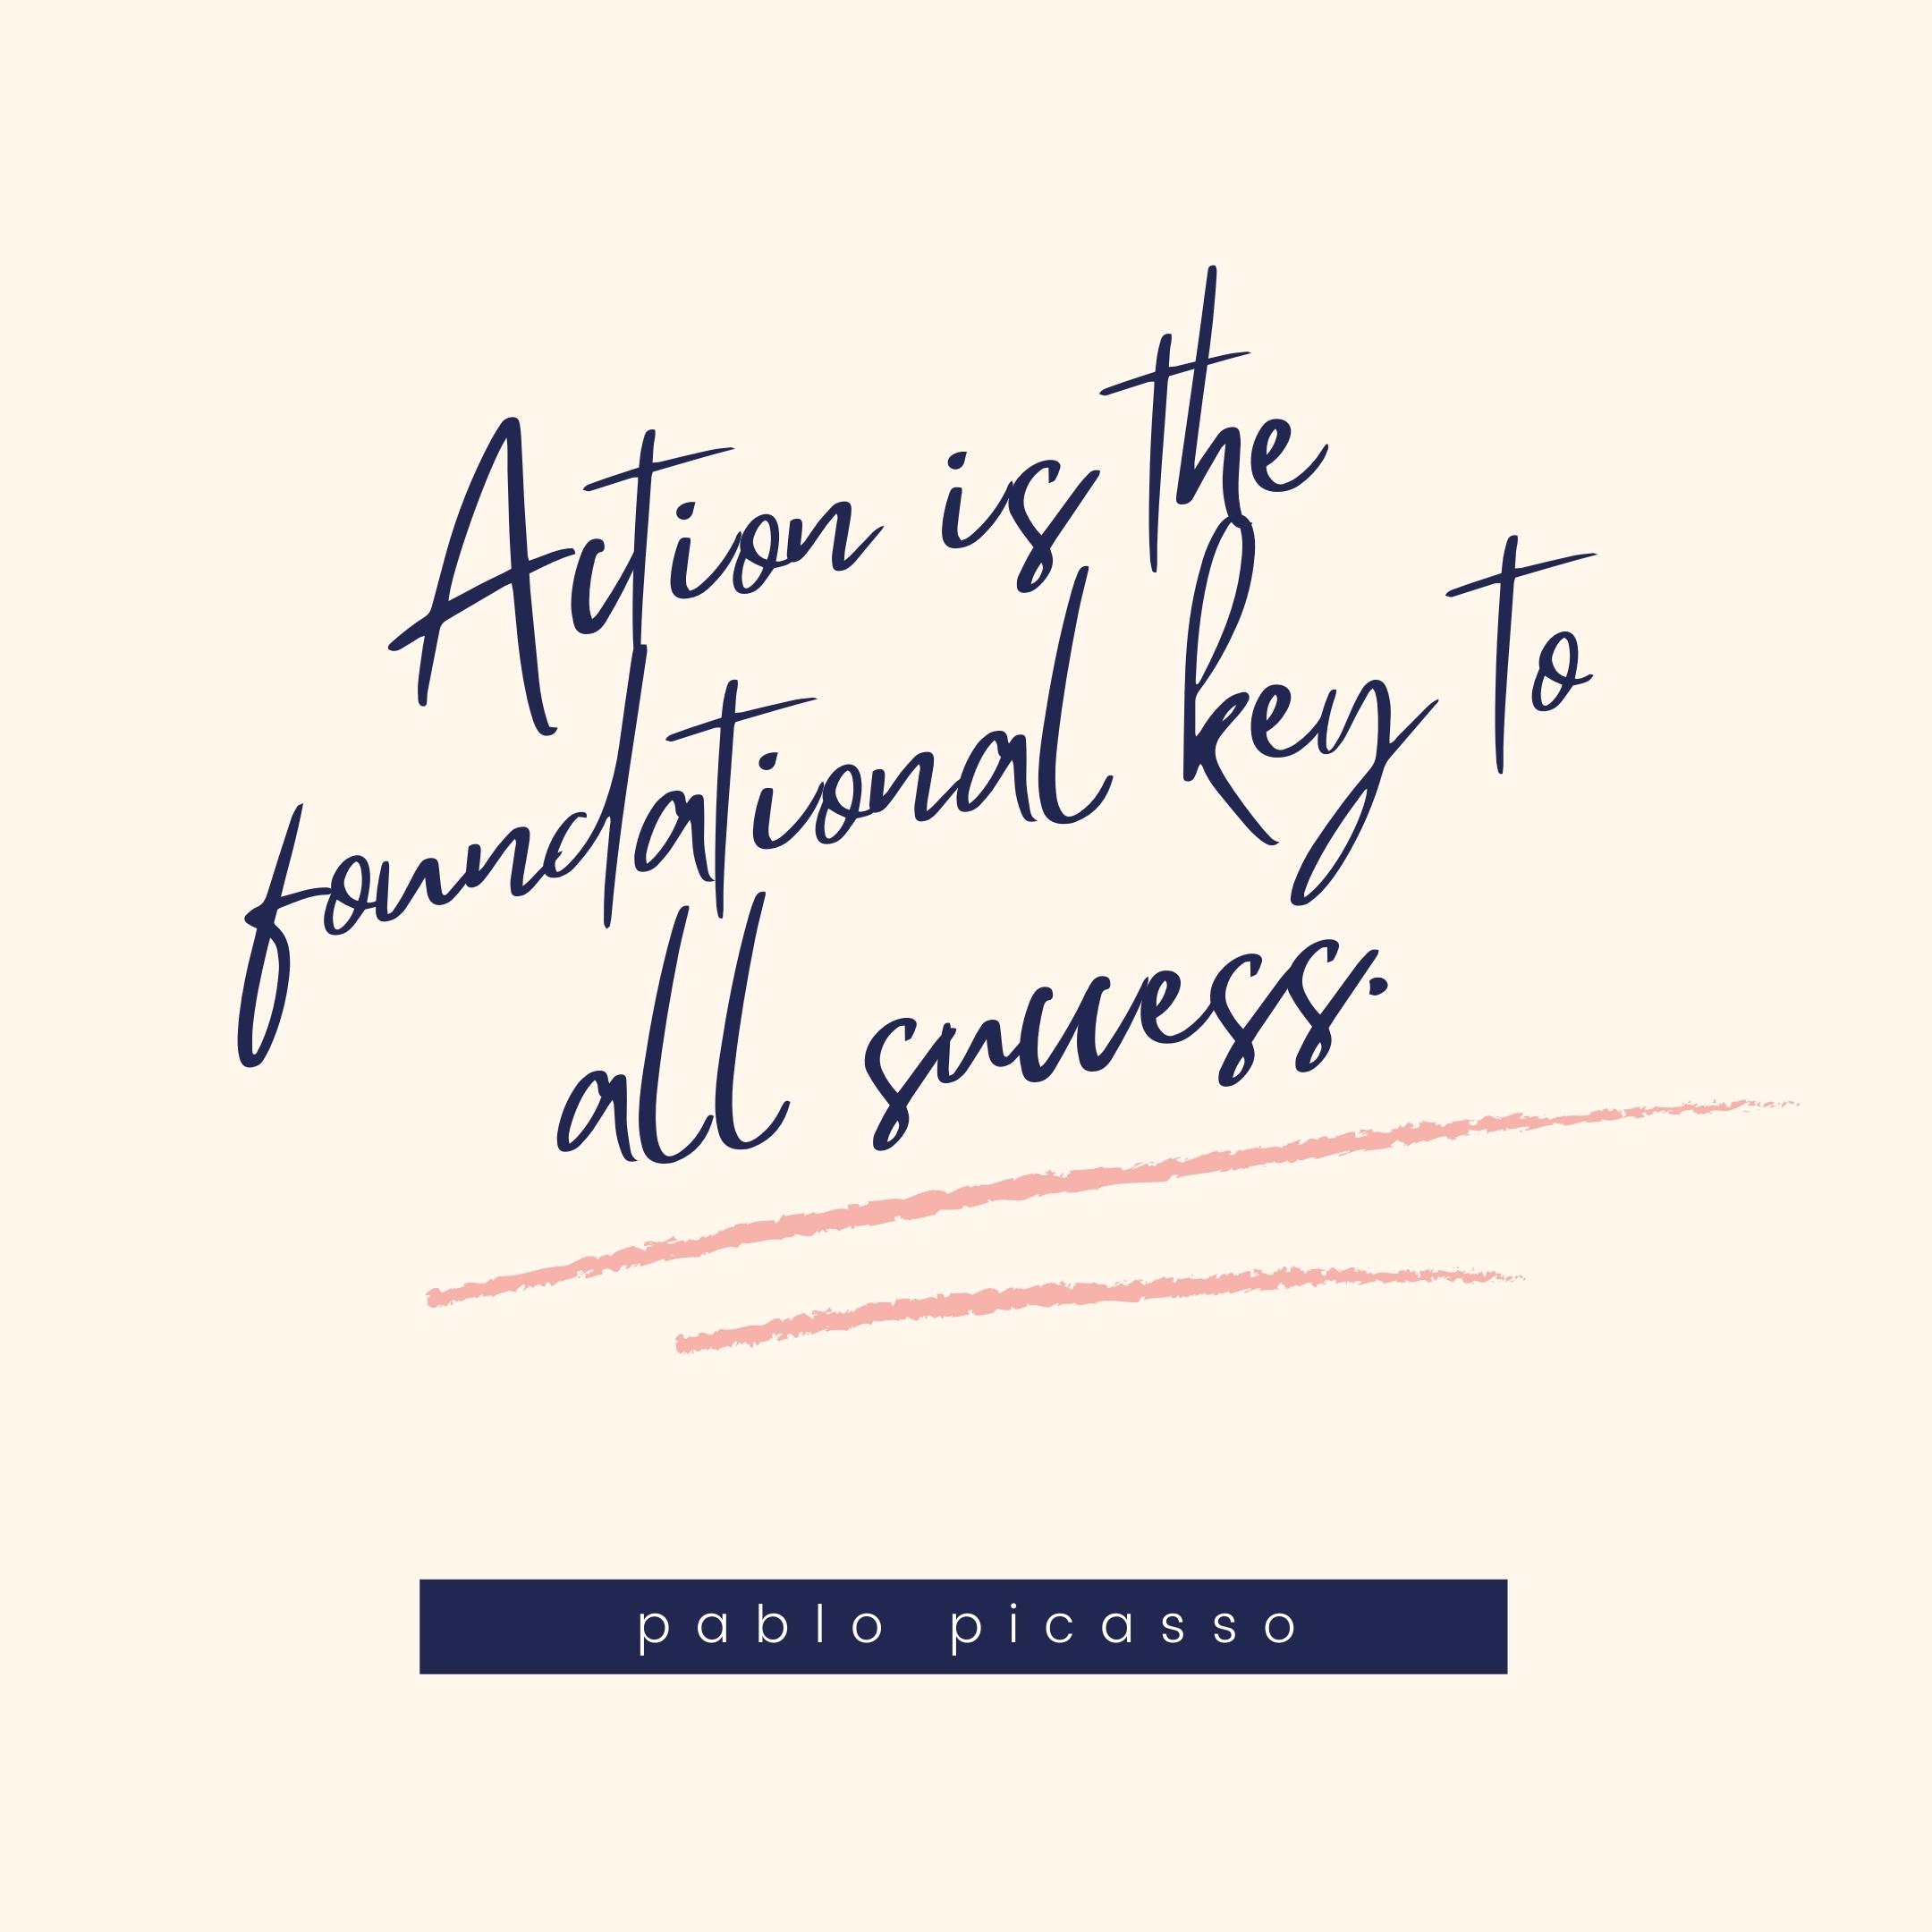 pablo picasso quote | monday motivation quotes